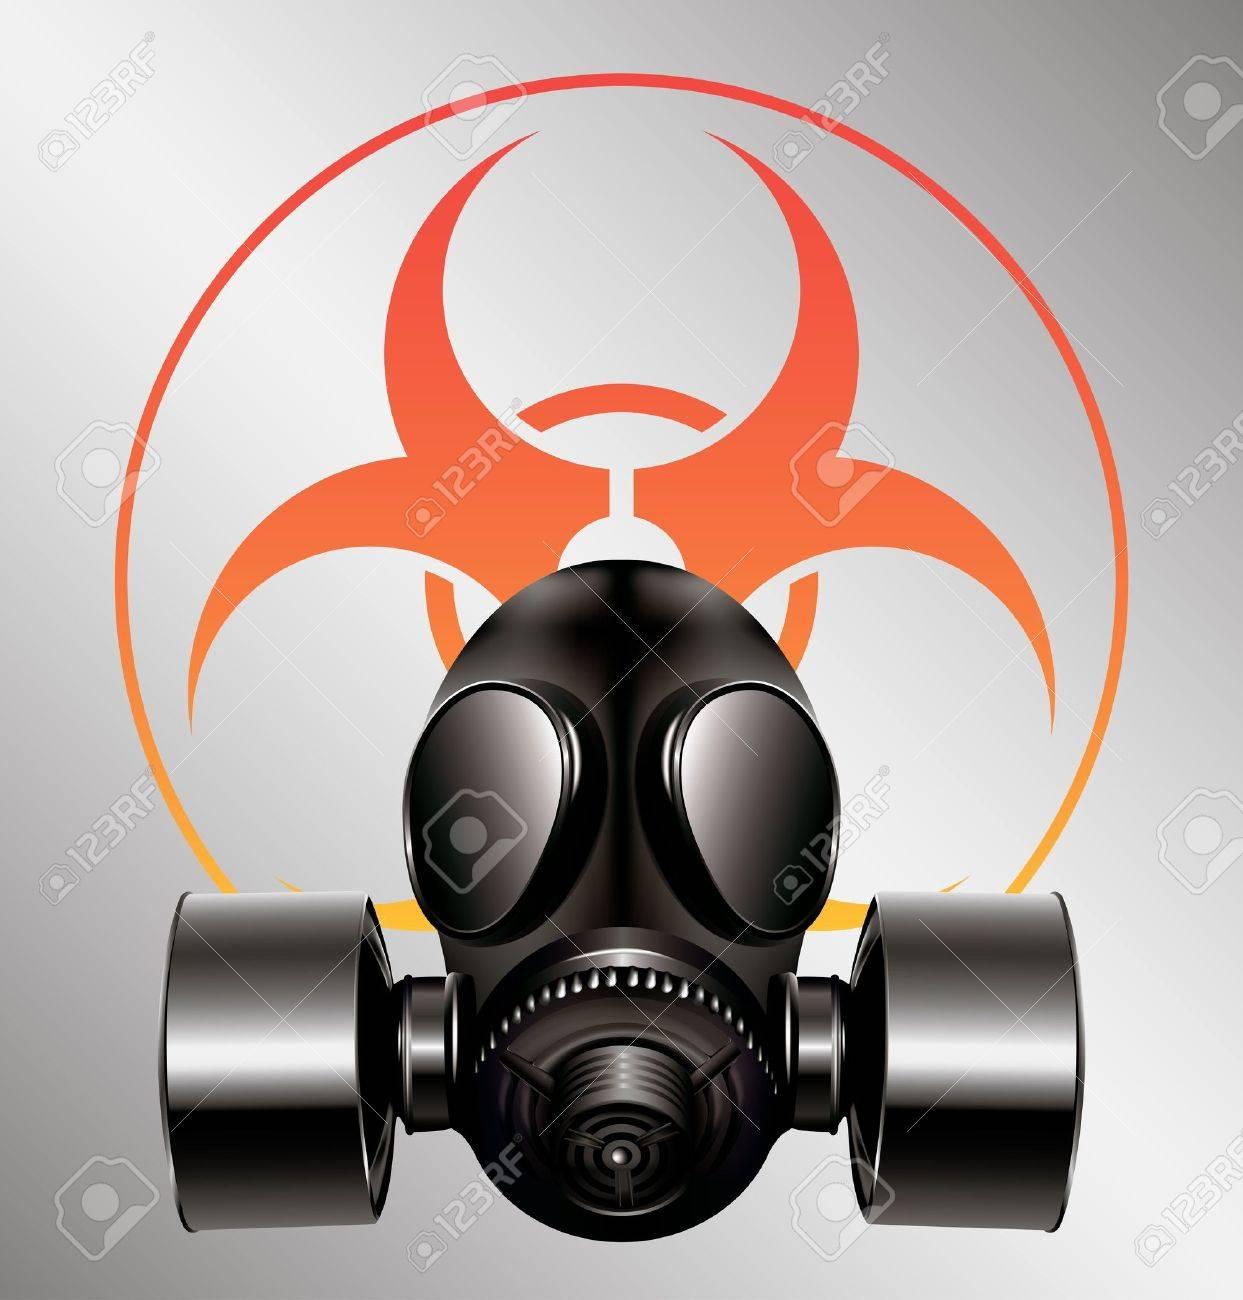 black gas mask with biohazard symbol Stock Vector - 14181090